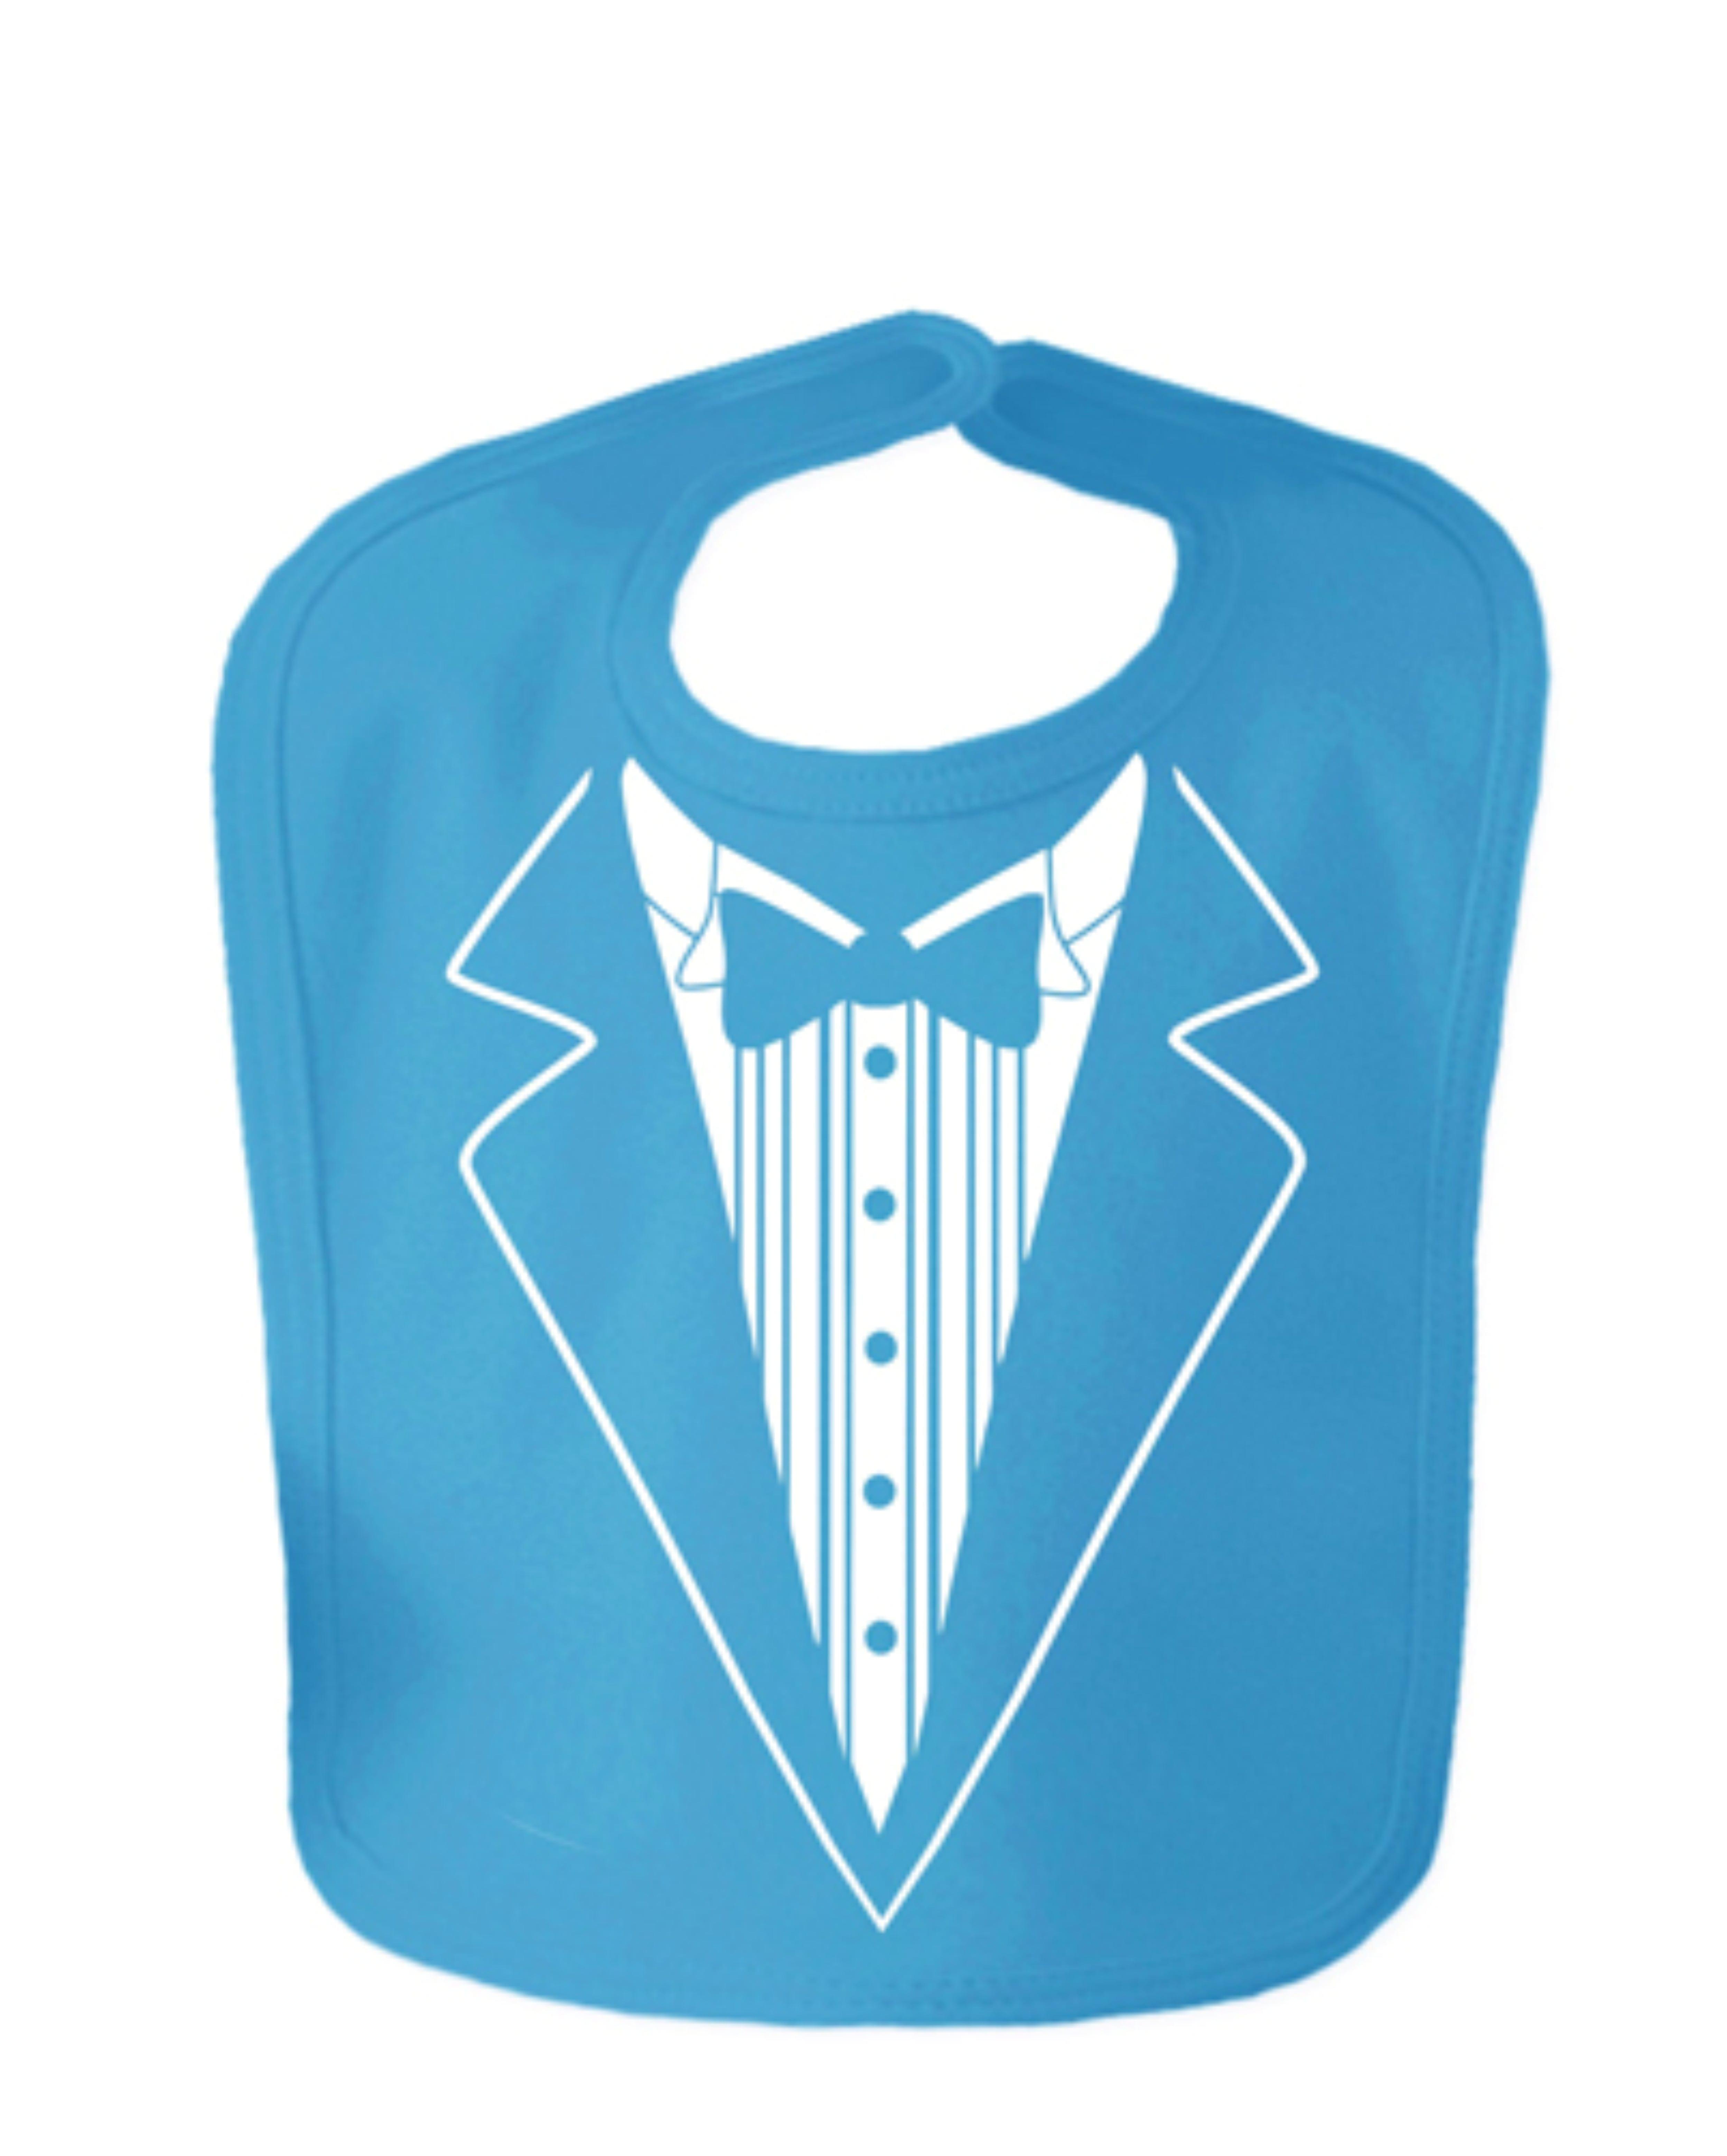 Sapphire Blue Tuxedo Velcro Baby Bib